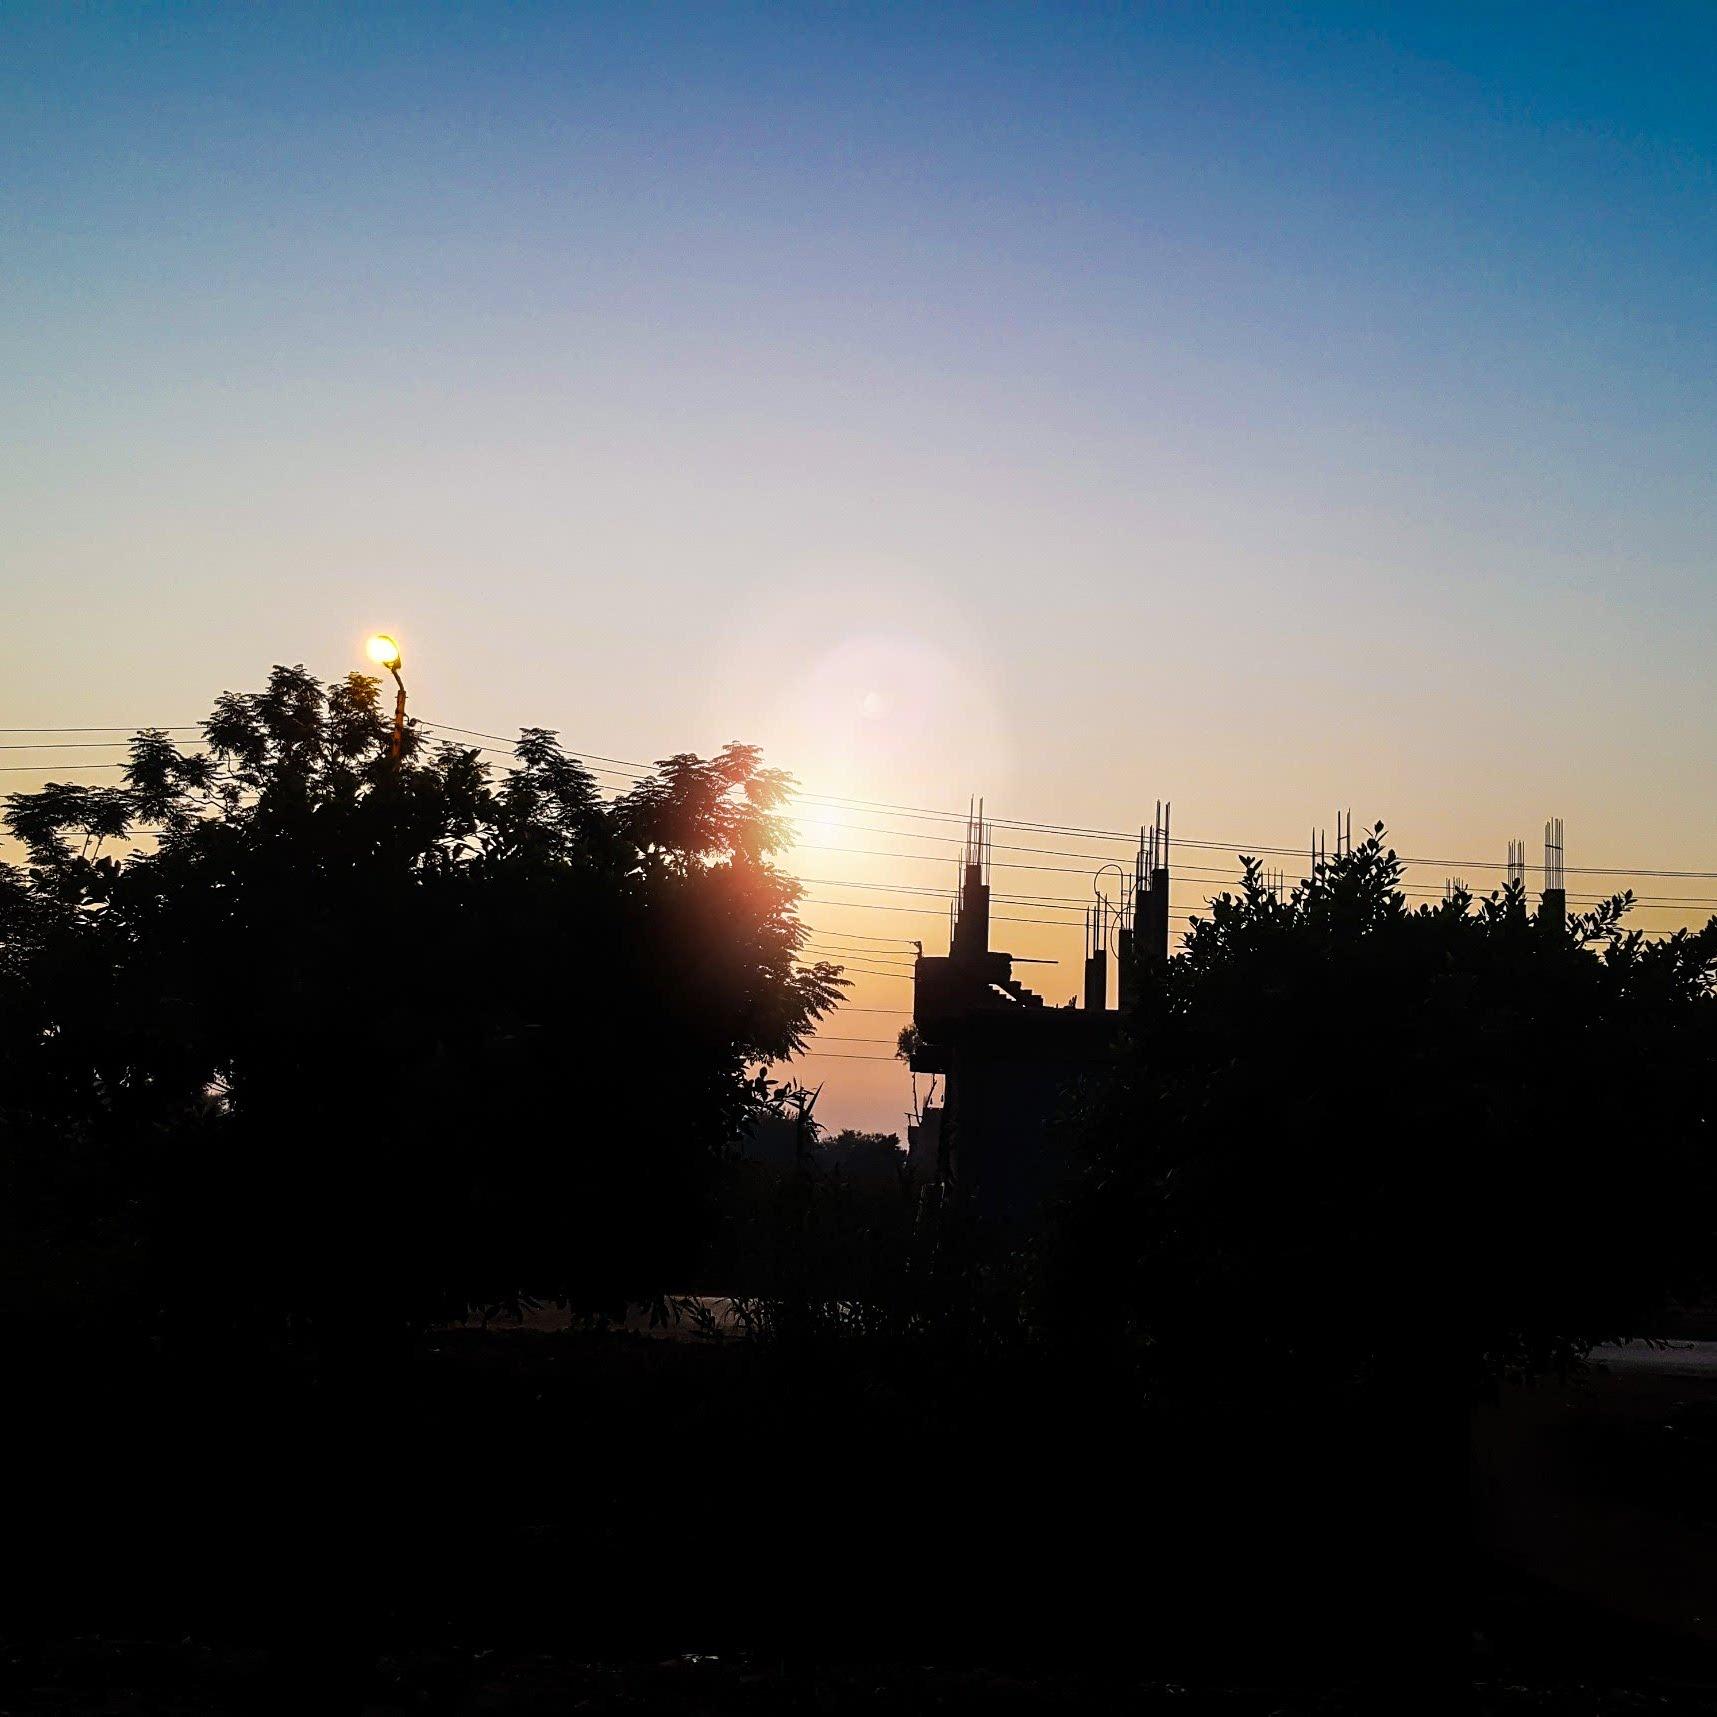 sunset by AbdElrahman Ayman